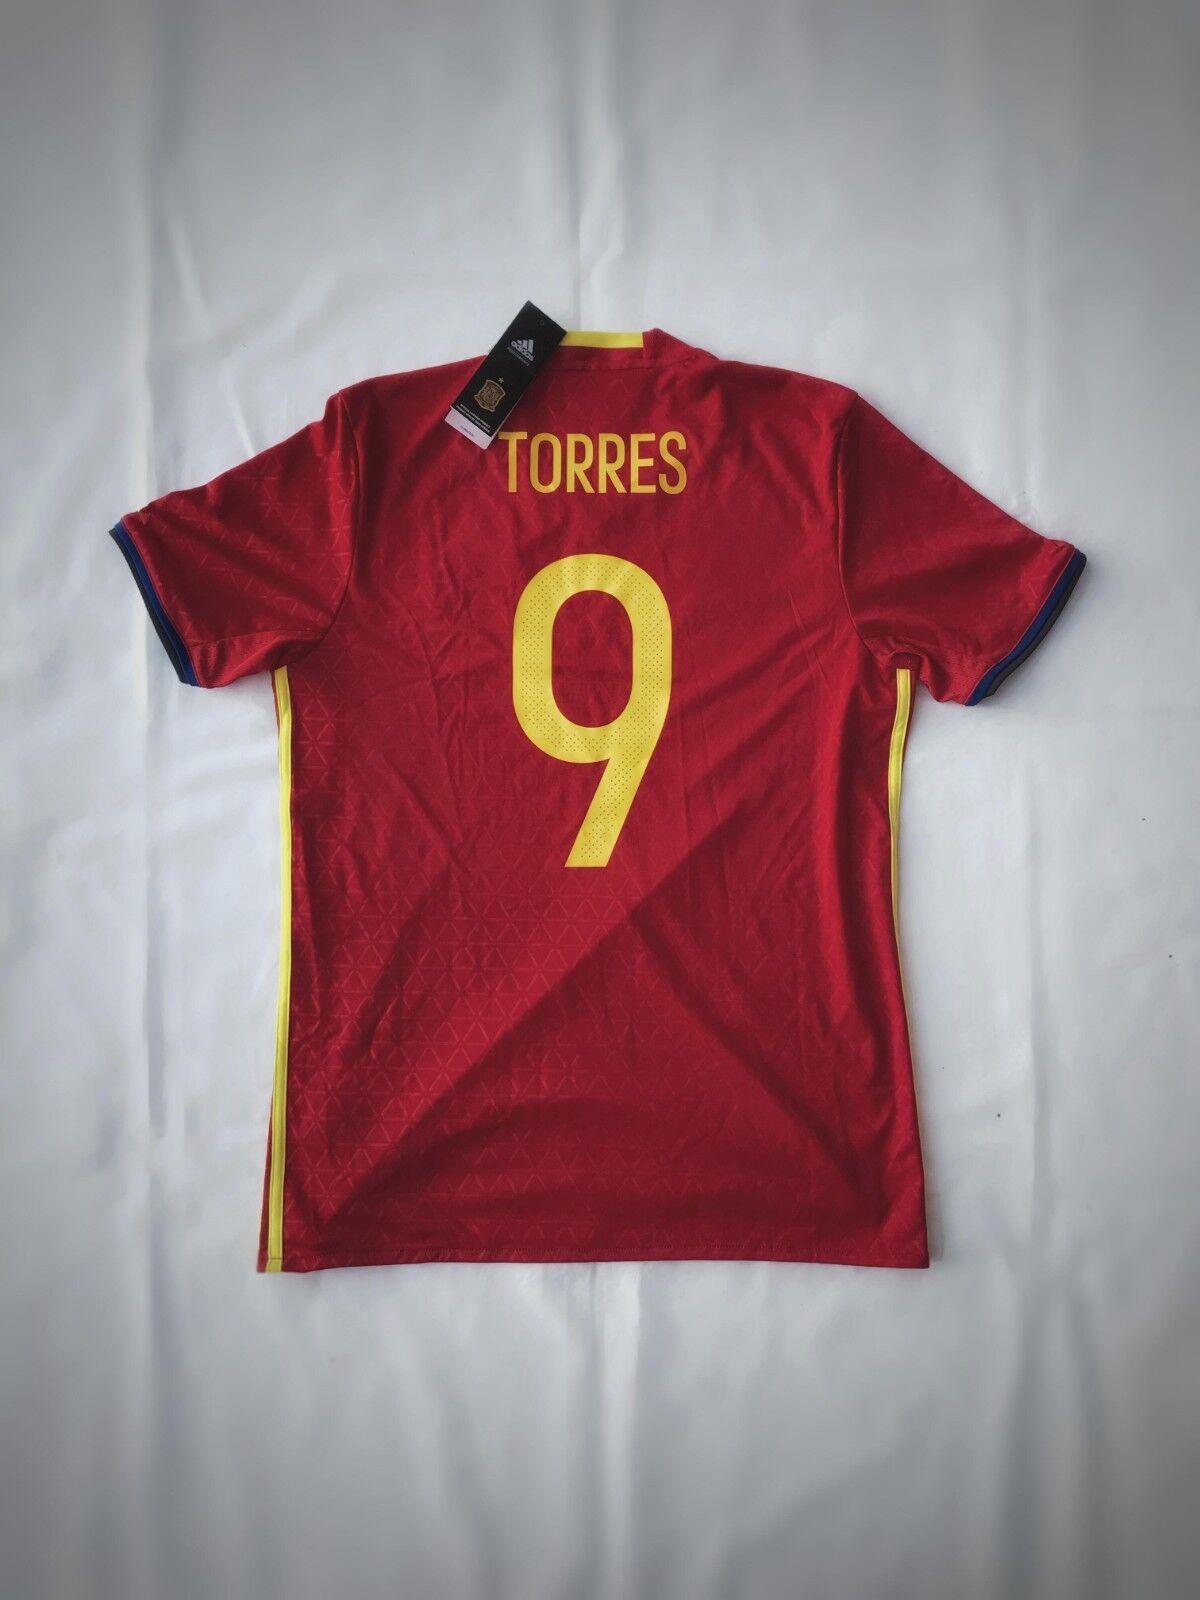 Adidas Spain 2016 Home Jersey  9 Fernanado Torres  Diuominiione Medium